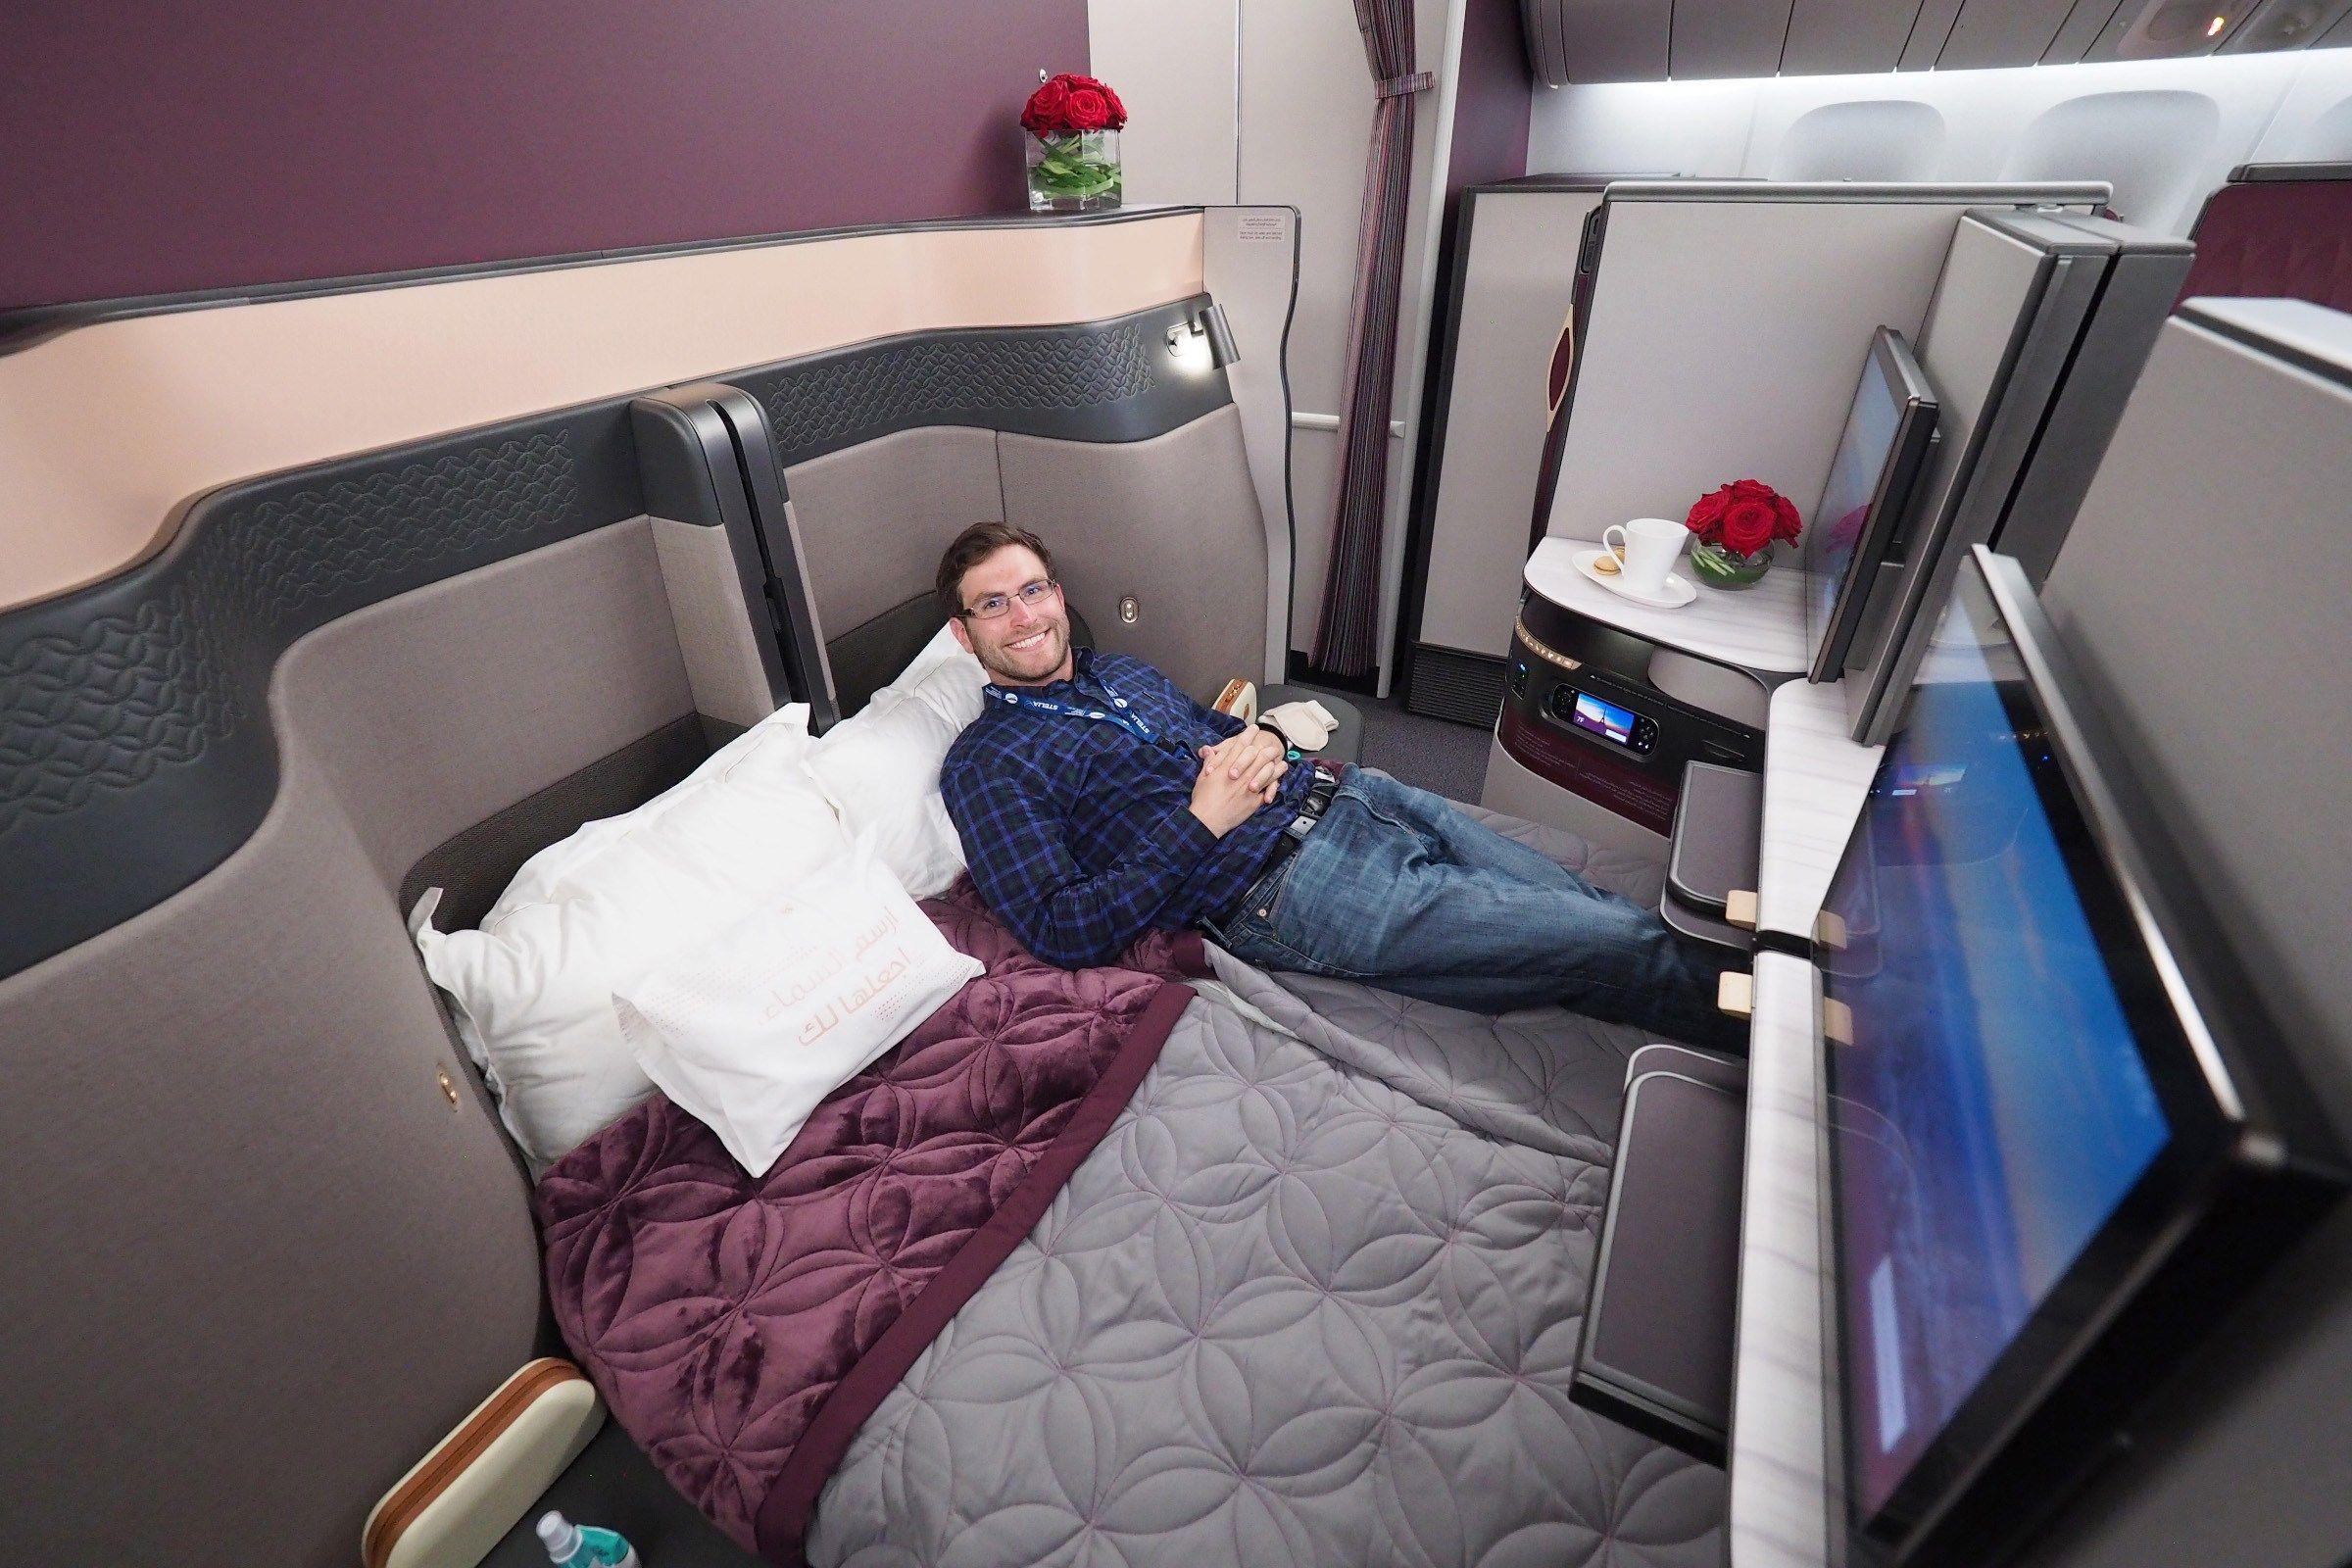 Suite Spot Ranking the World's Best BusinessClass Seats